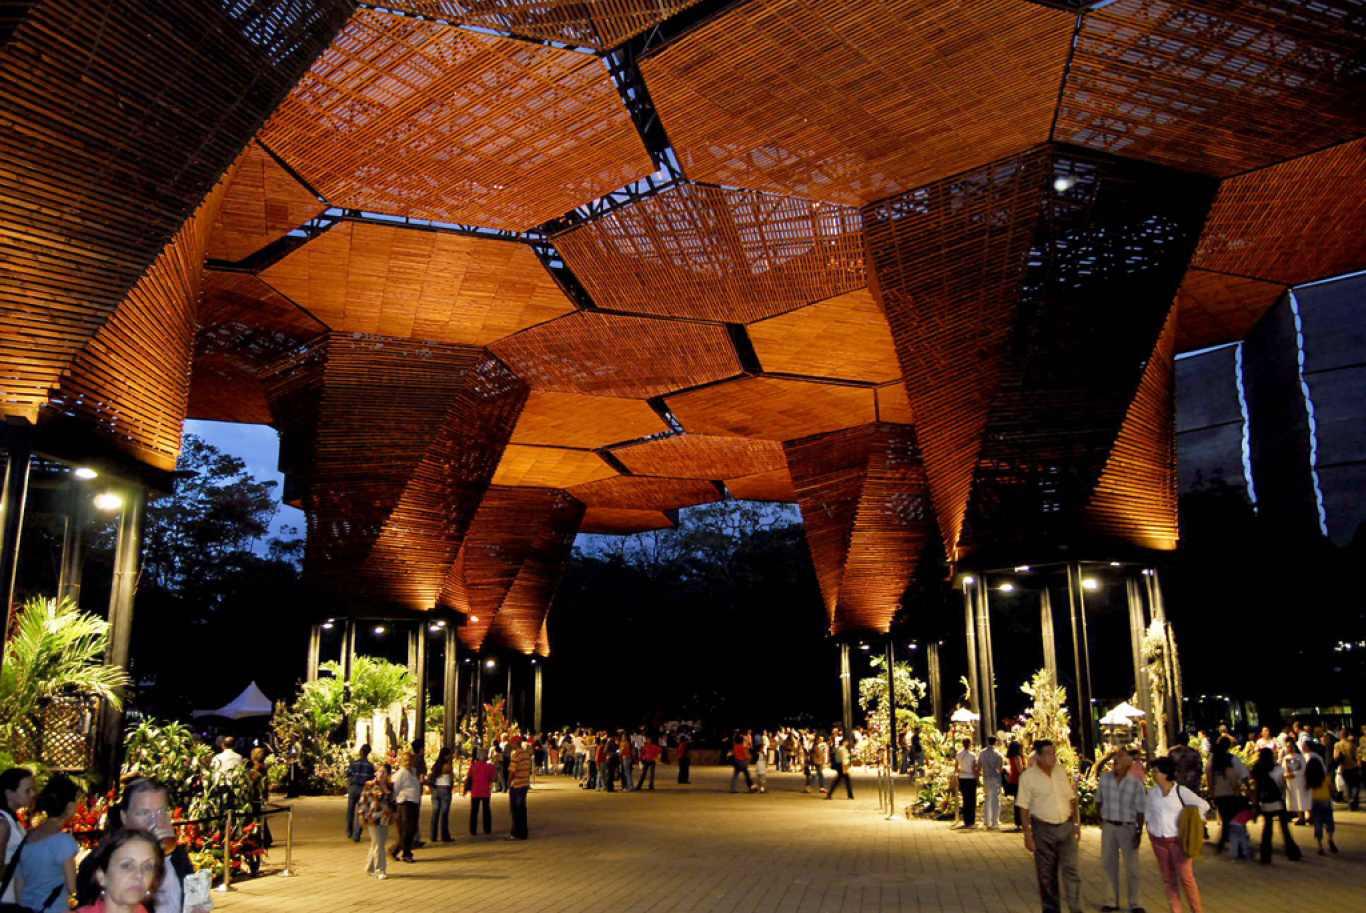 Descubre tu mundo destino medell n colombia en sus for Jardin botanico bogota nocturno 2016